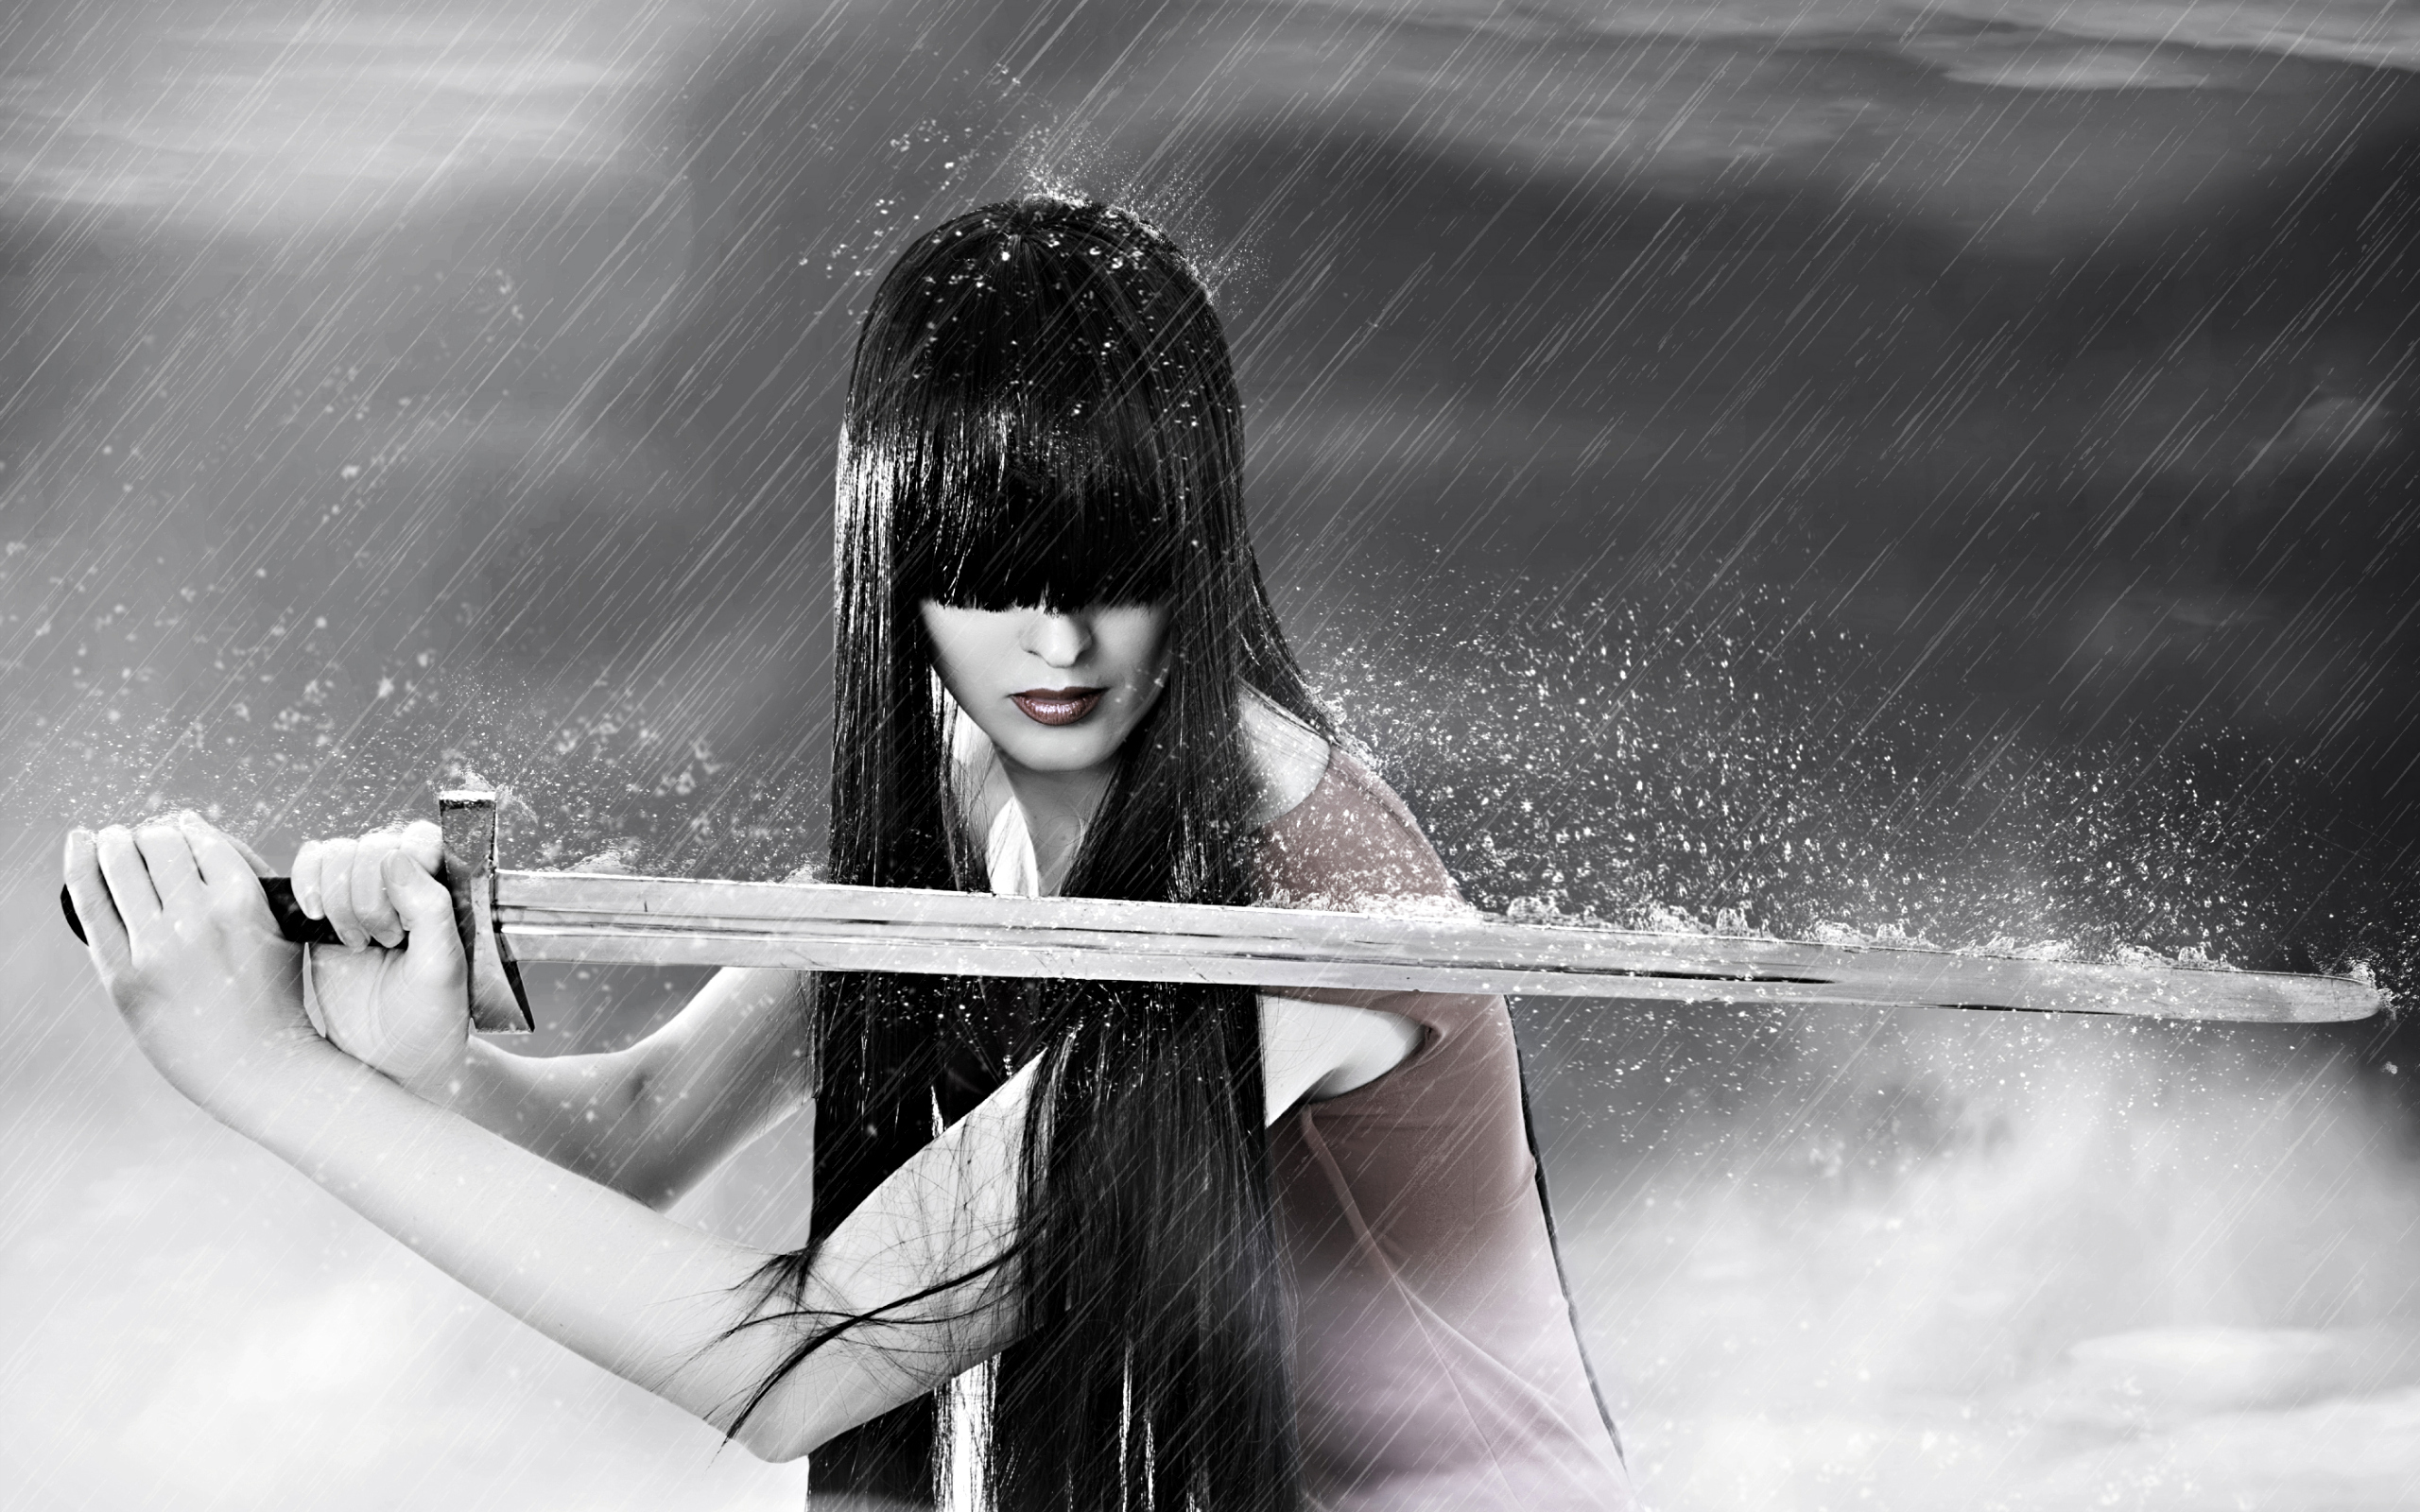 Women Warrior Artwork Sword Rain Cyberpunk Cyberpunk: Women Warrior Full HD Wallpaper And Background Image